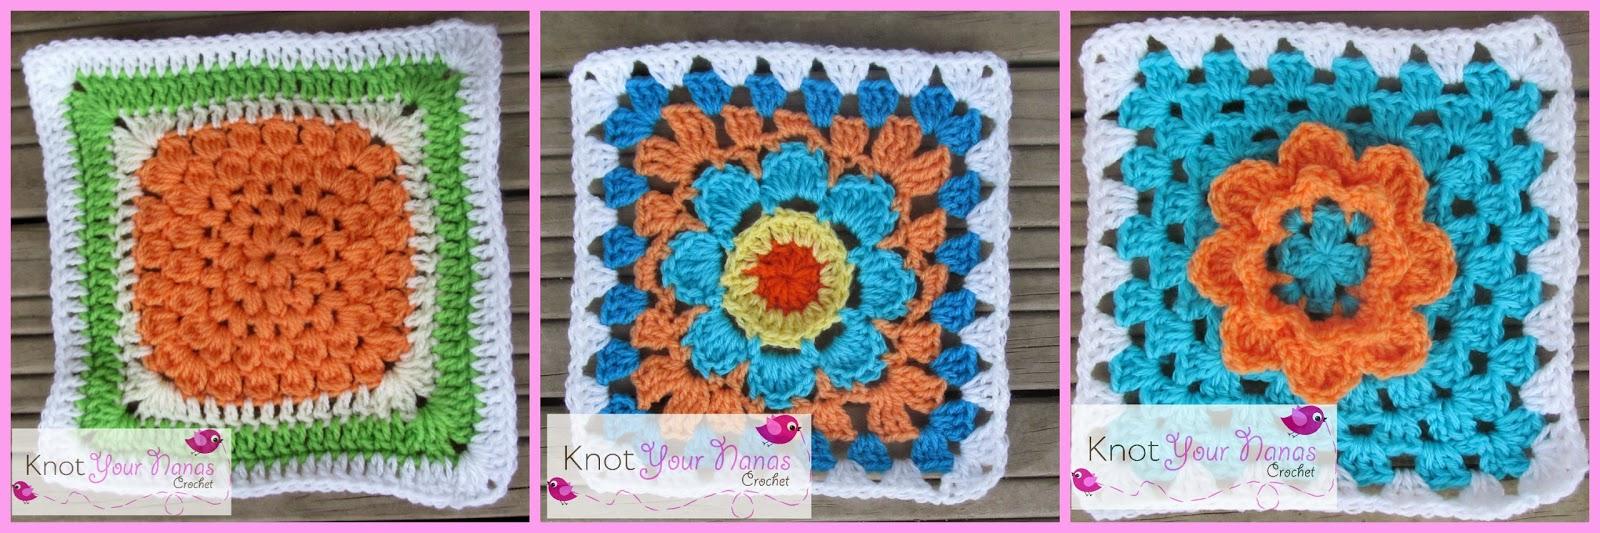 Knot Your Nana's Crochet: Granny Square Crochet Along